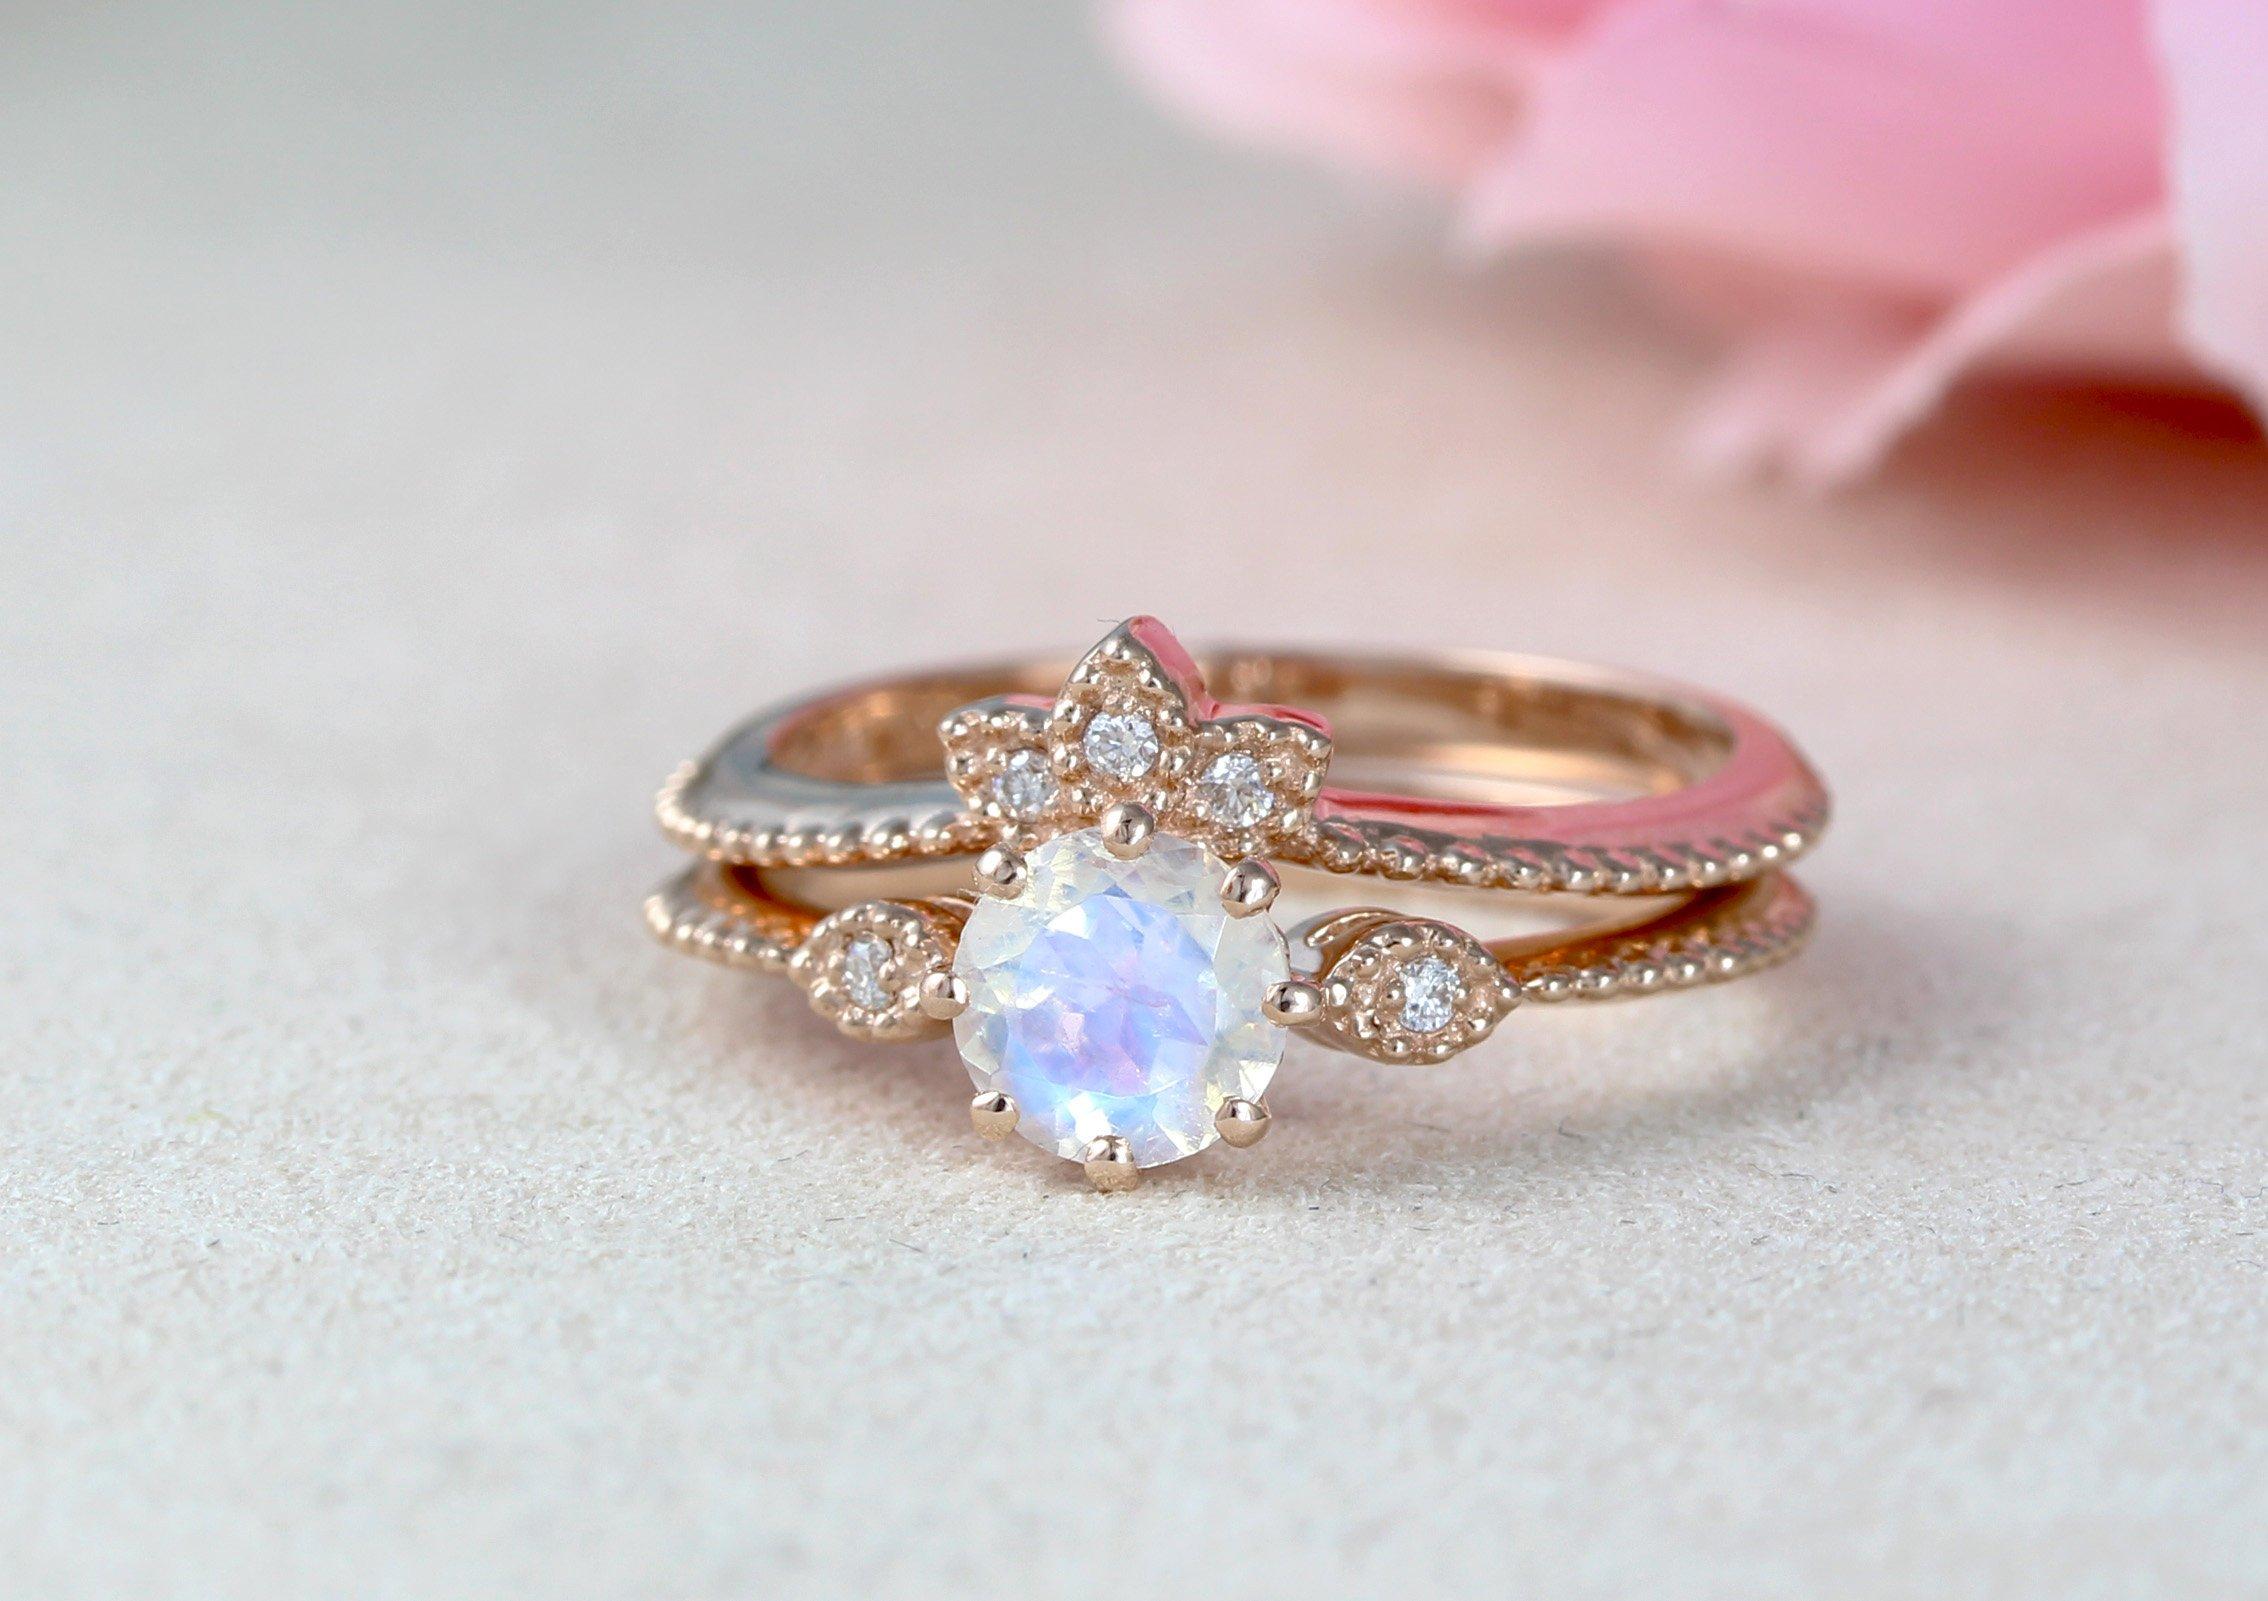 Moonstone Engagement Ring Vintage Rose Gold Antique Ring Rainbow Moonstone Ring Promise Anniversary Gift For Christmas Benati